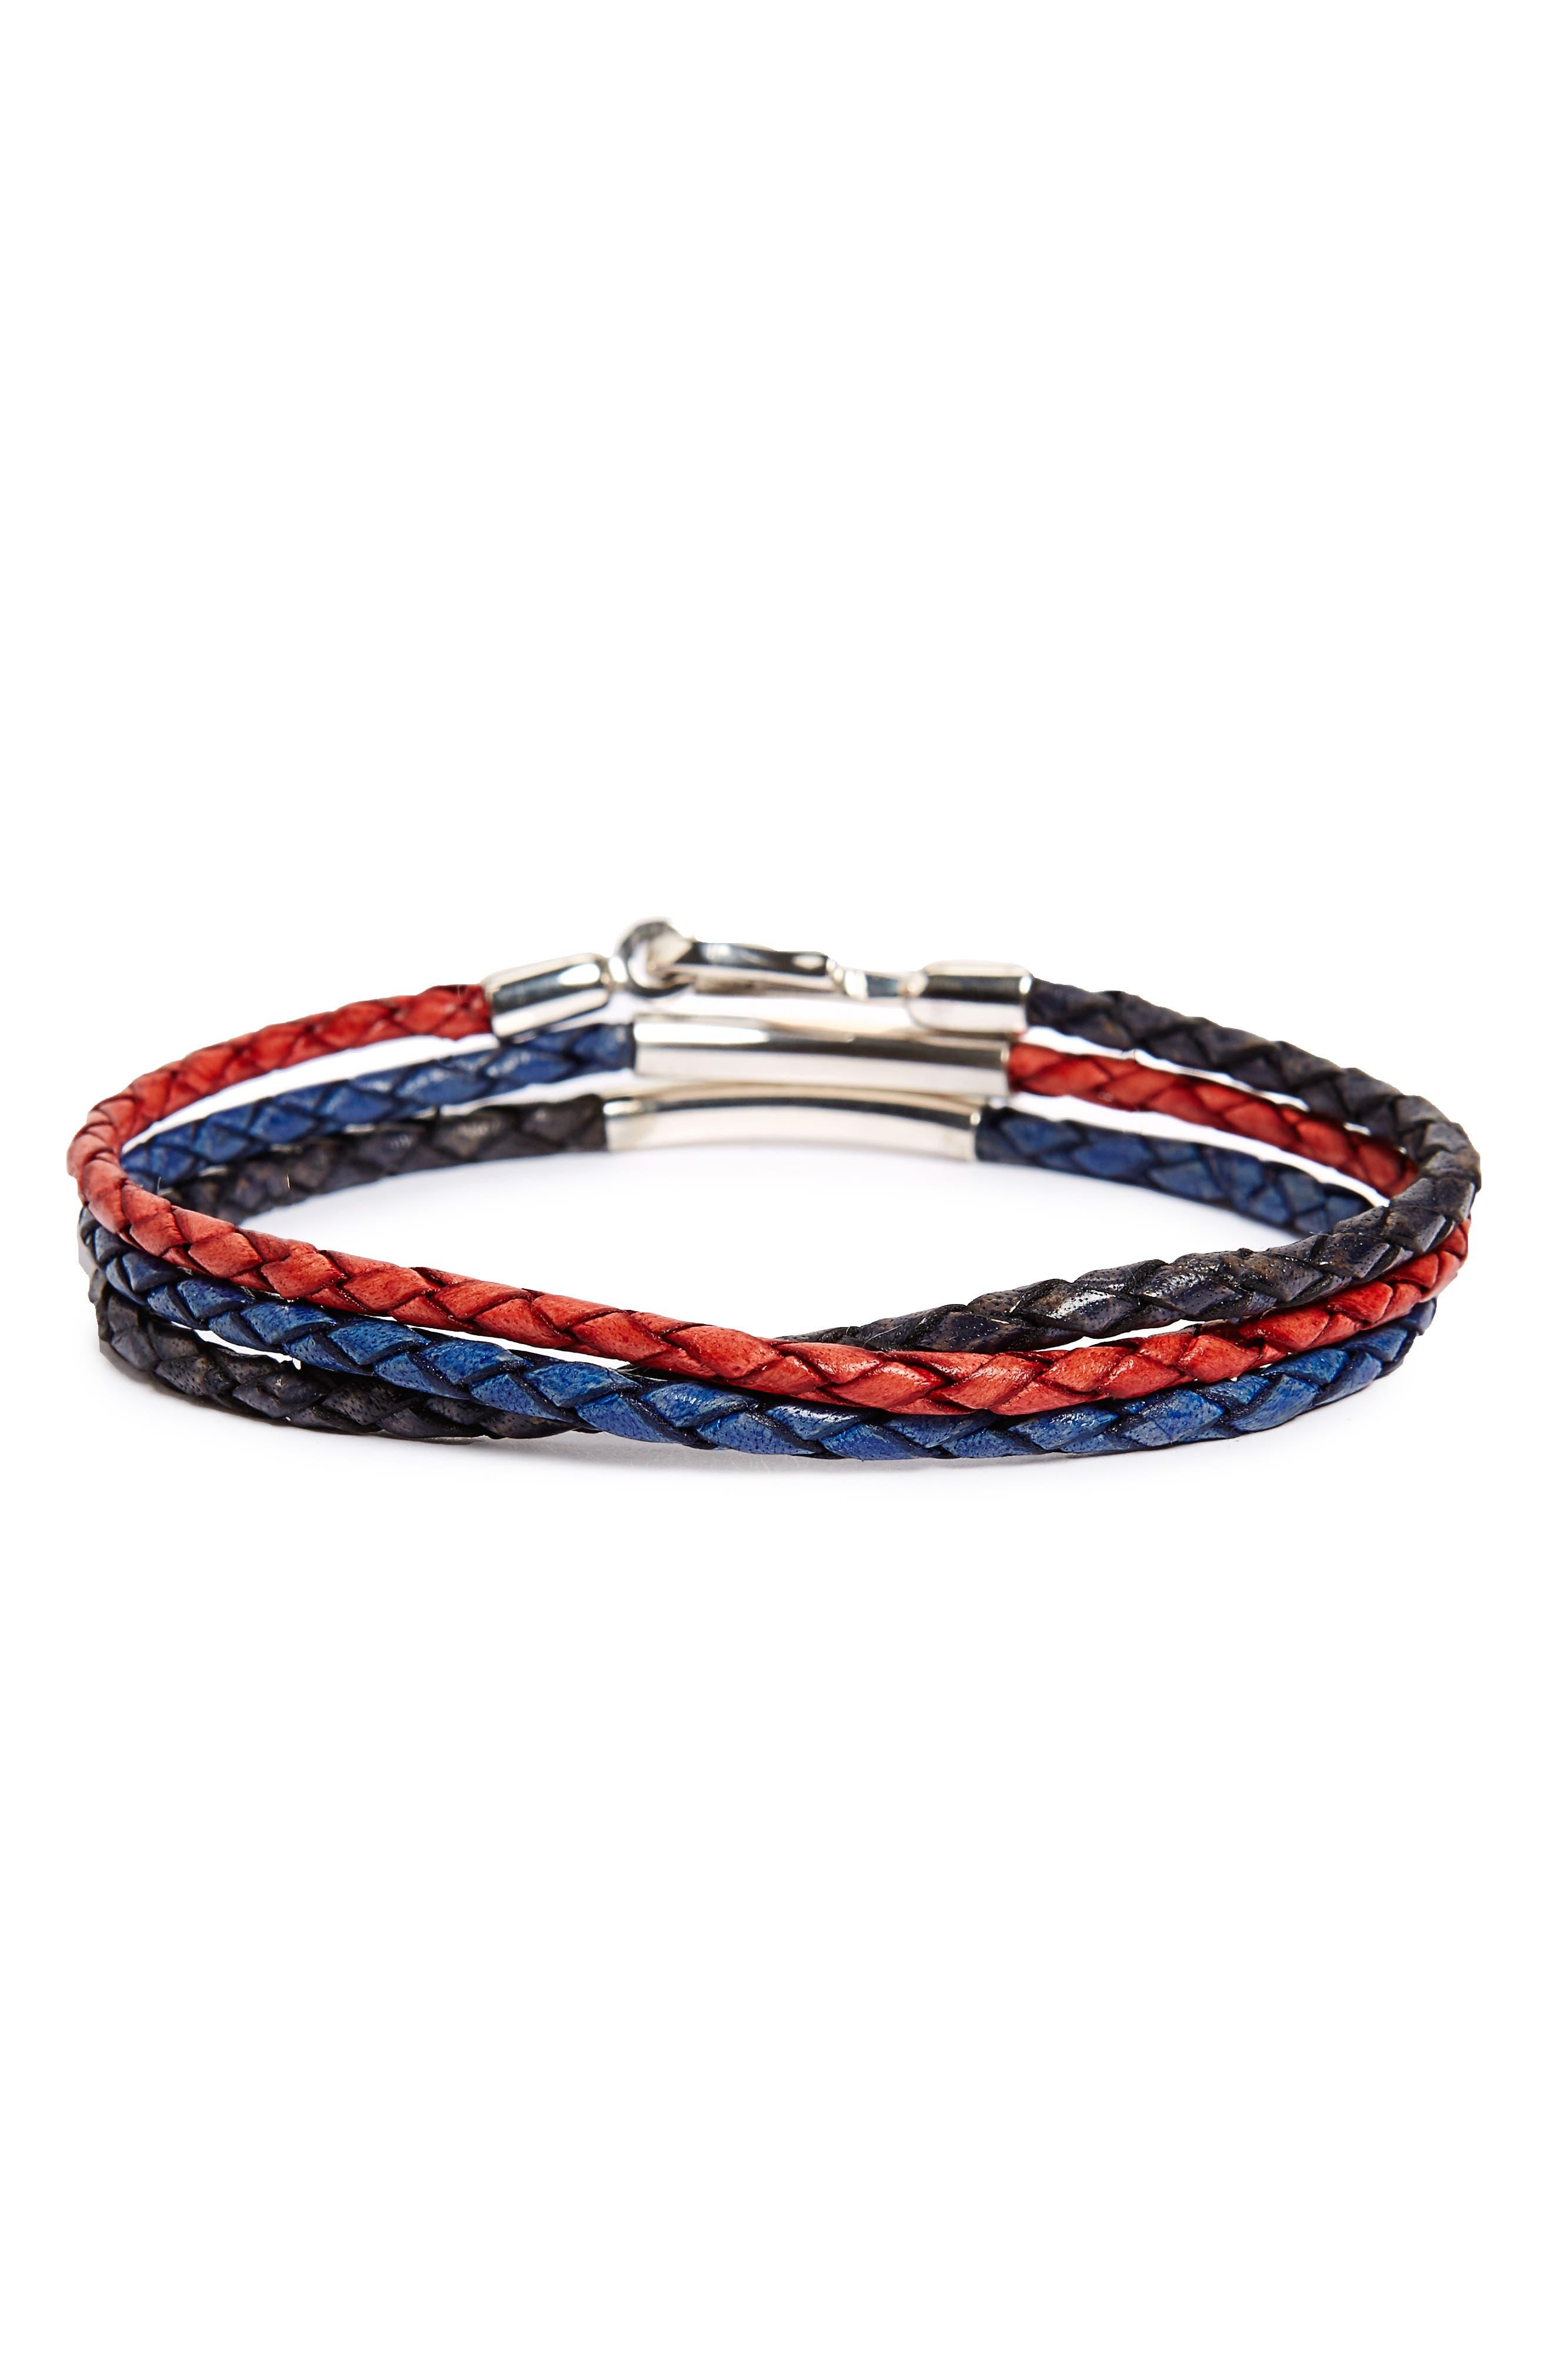 Alternate Image 1 Selected - Caputo & Co. Braided Leather Wrap Bracelet